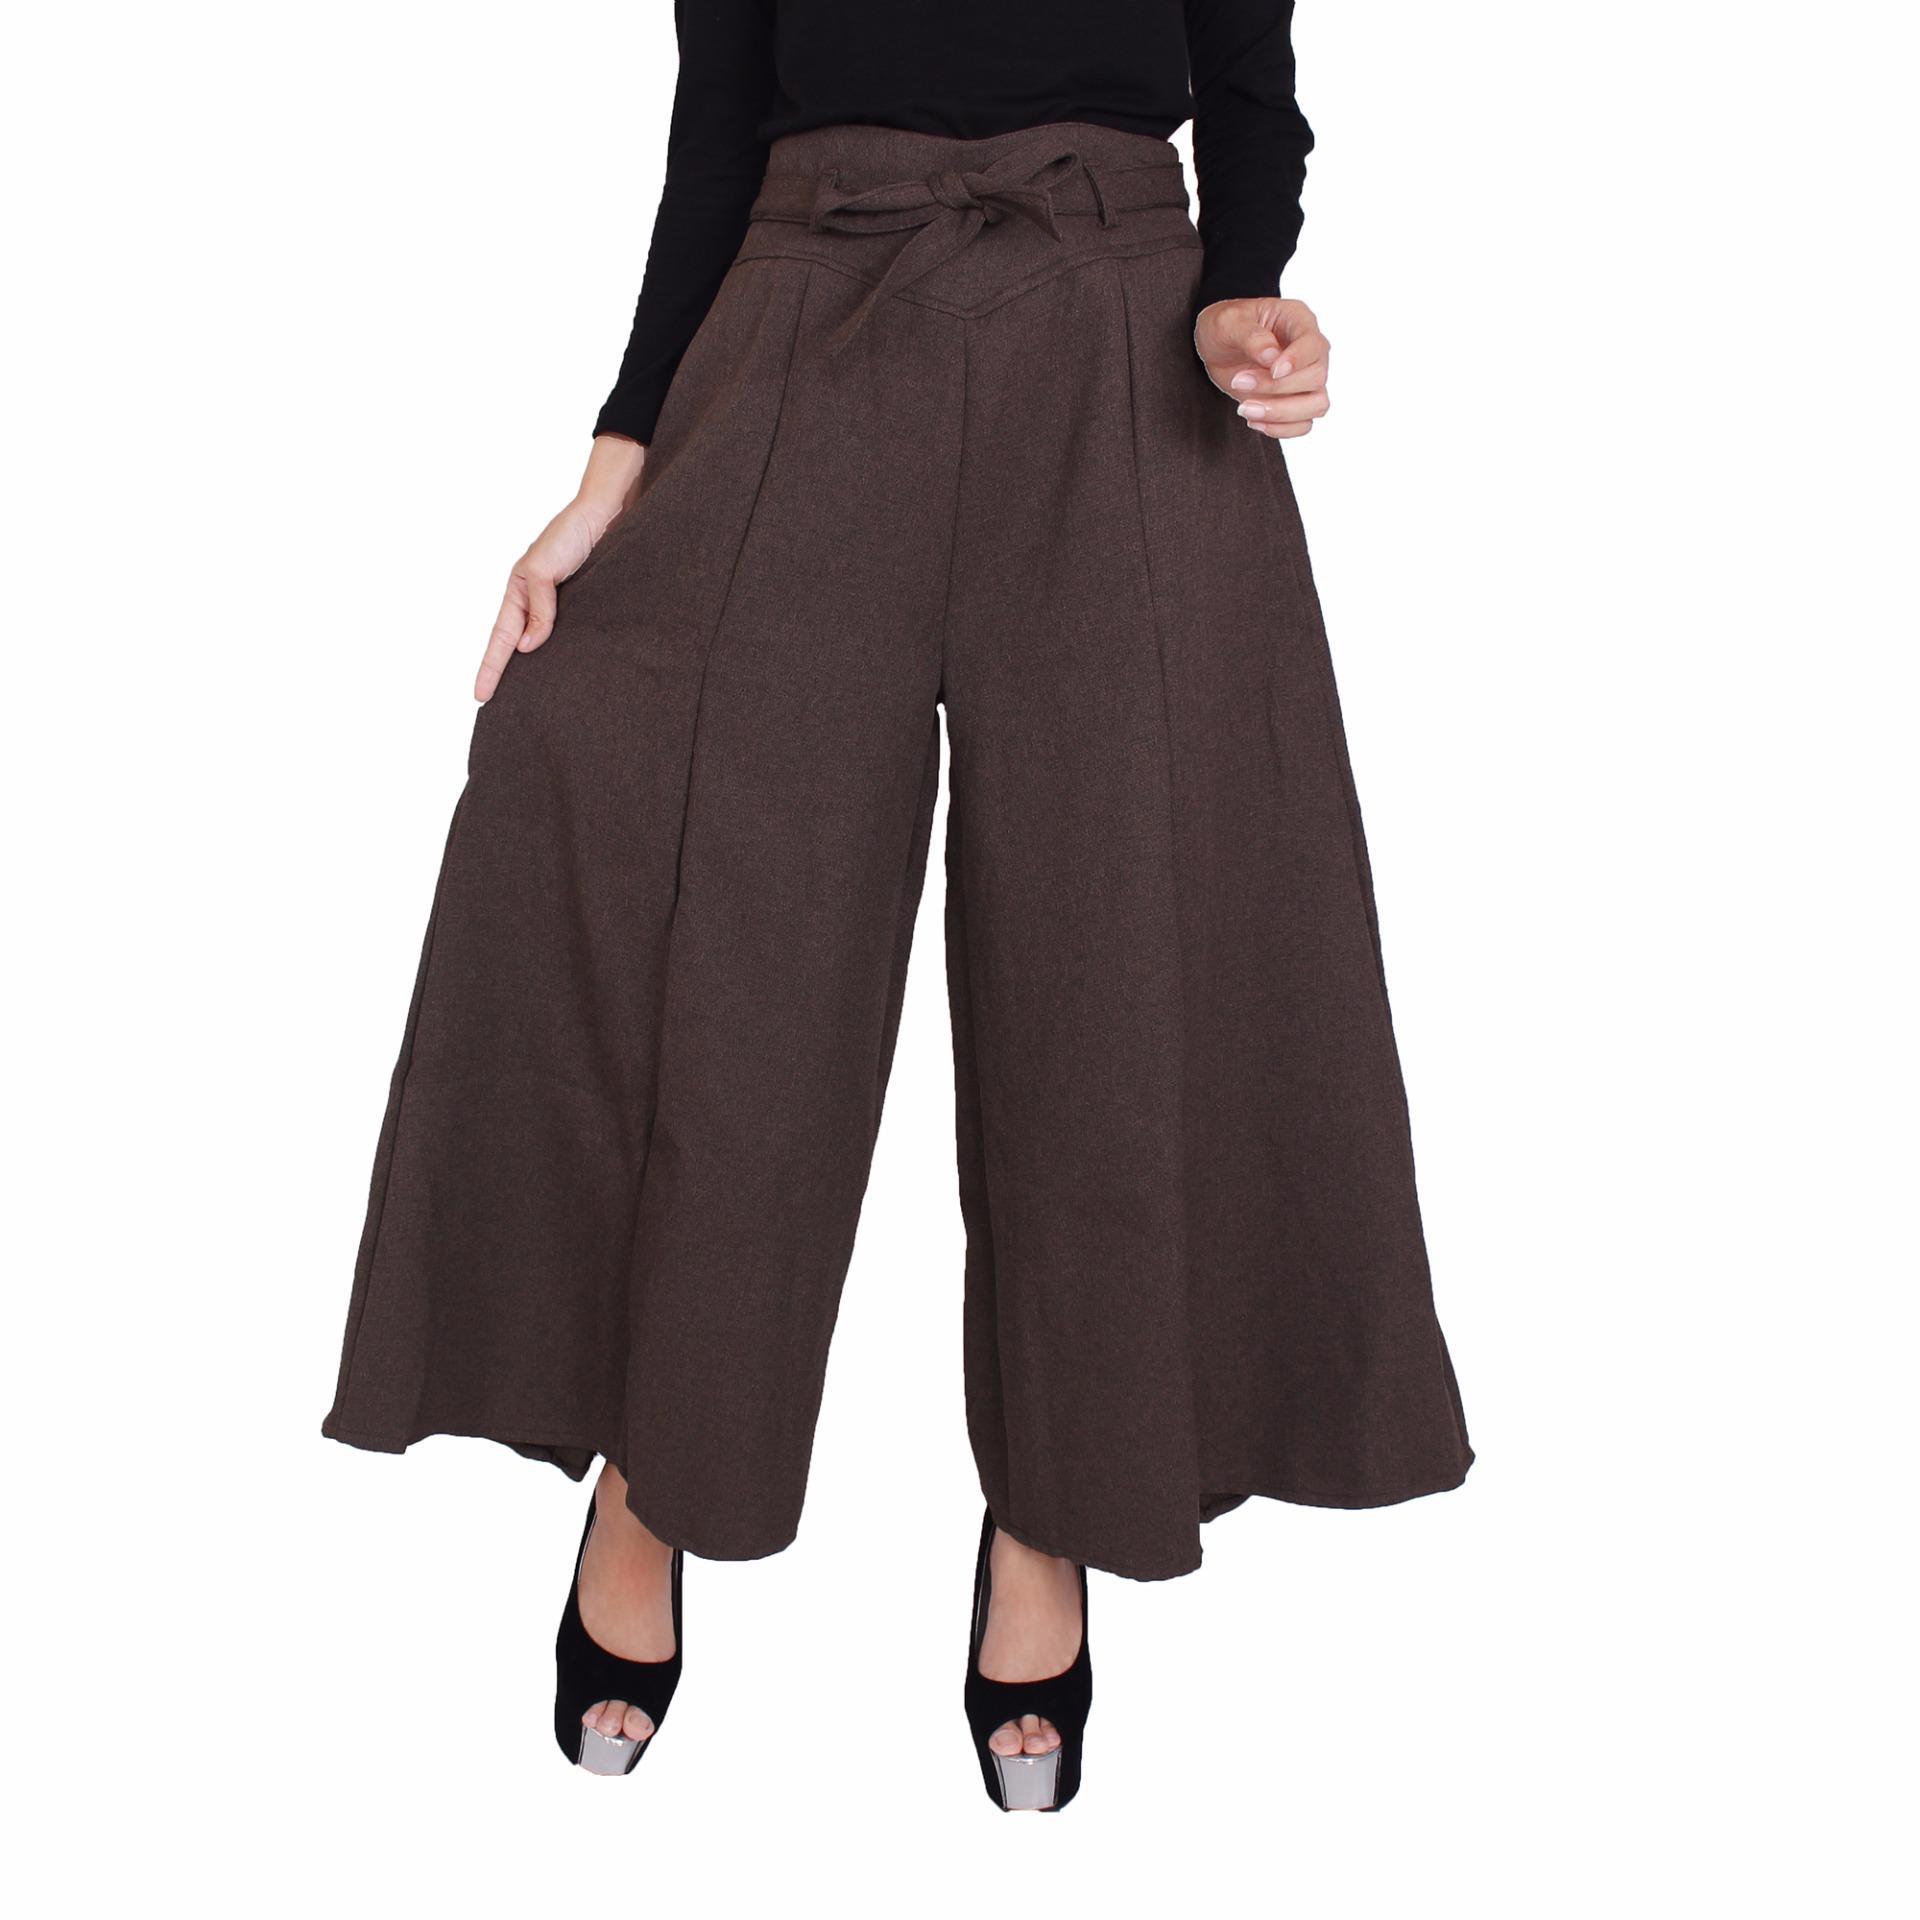 Spesifikasi Haymeestore Celana Kulot Kantor Panjang Wanita Celana Cullot Kantor Wanita Kantor Casual Fashion Murah